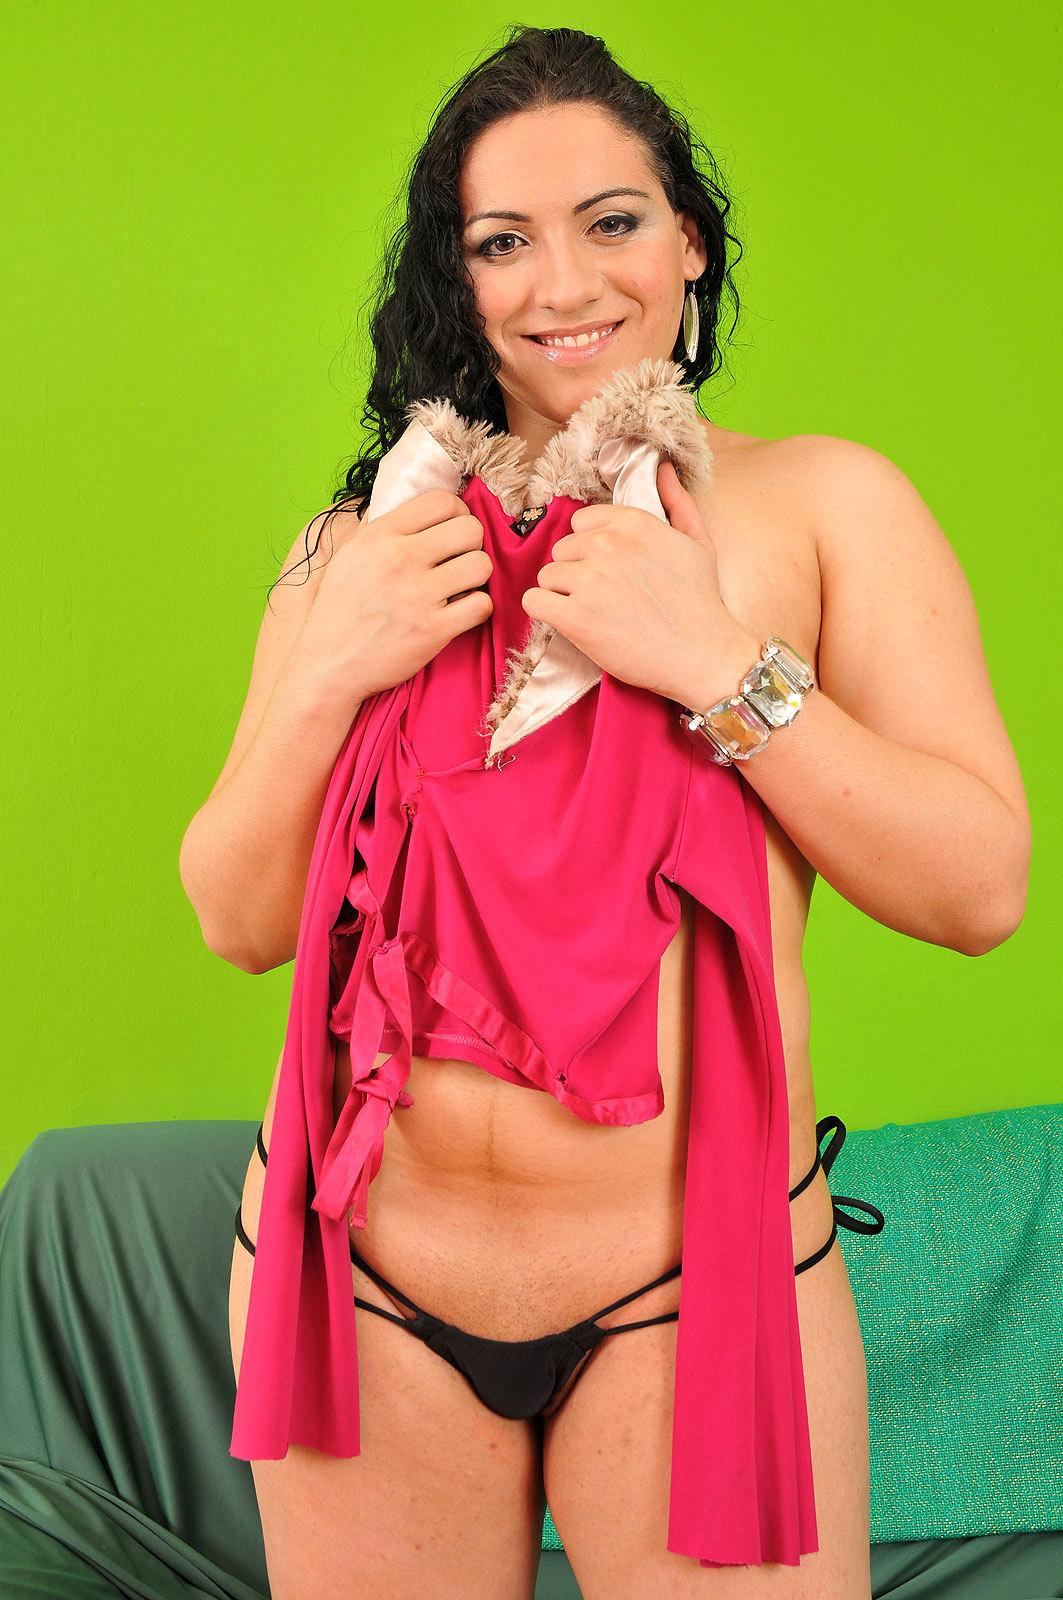 Steamy Brunette Tranny Raissa Sampaio Strips Down Outfit